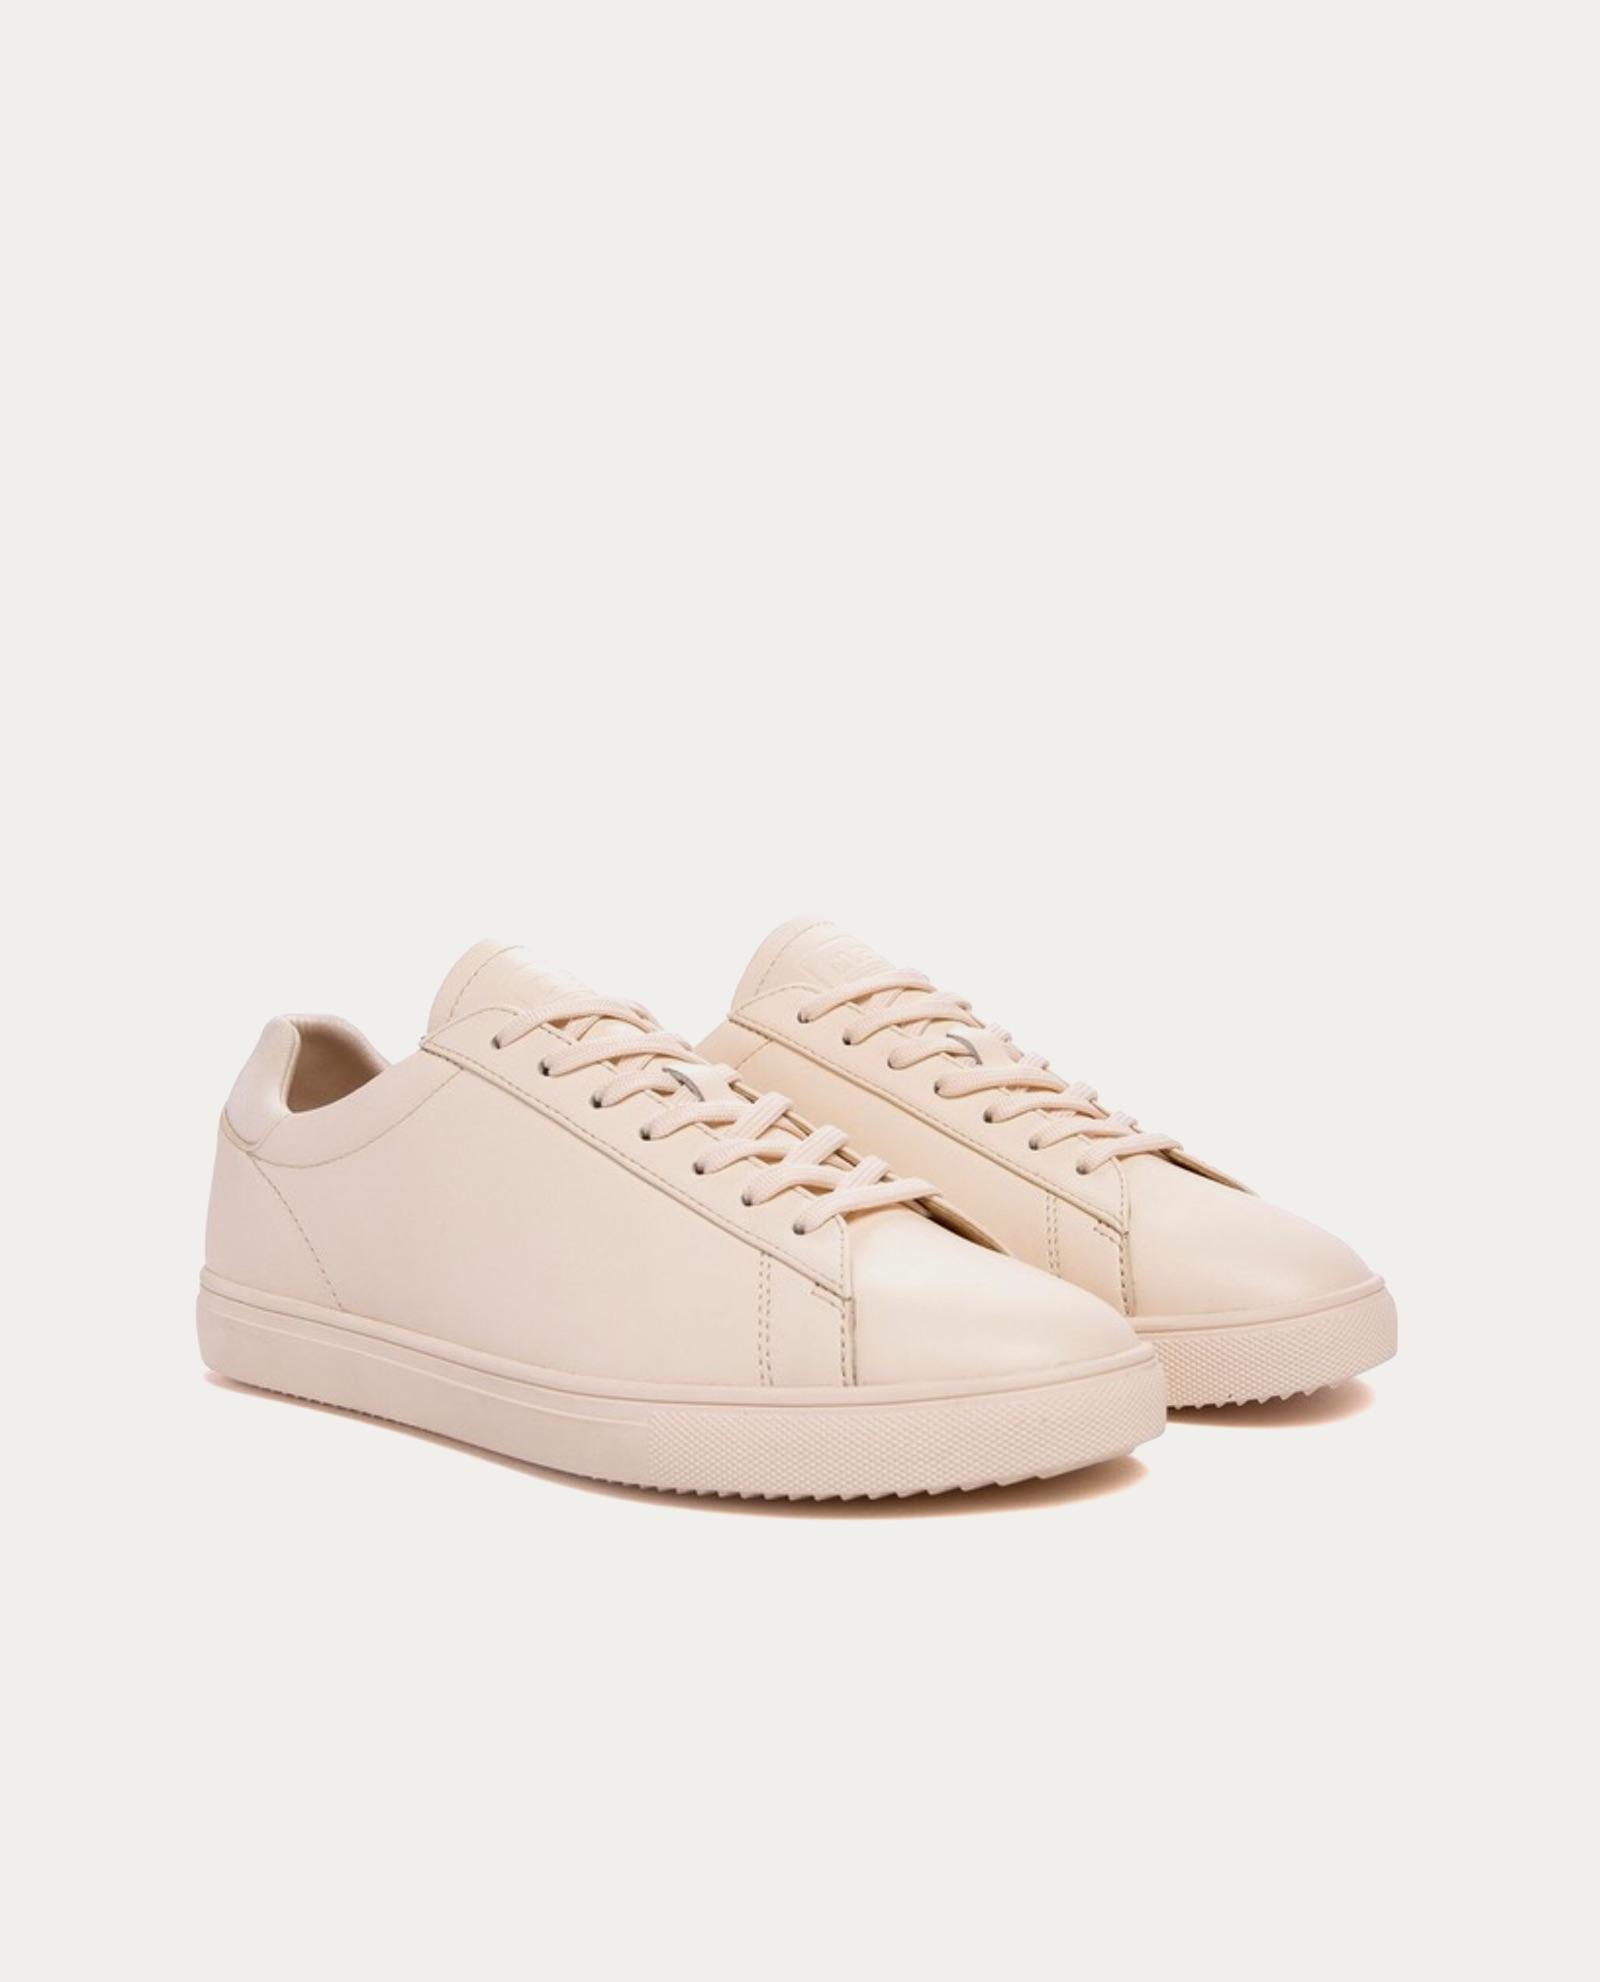 clae_chaussure_sniquers_bradley_leather_ecru